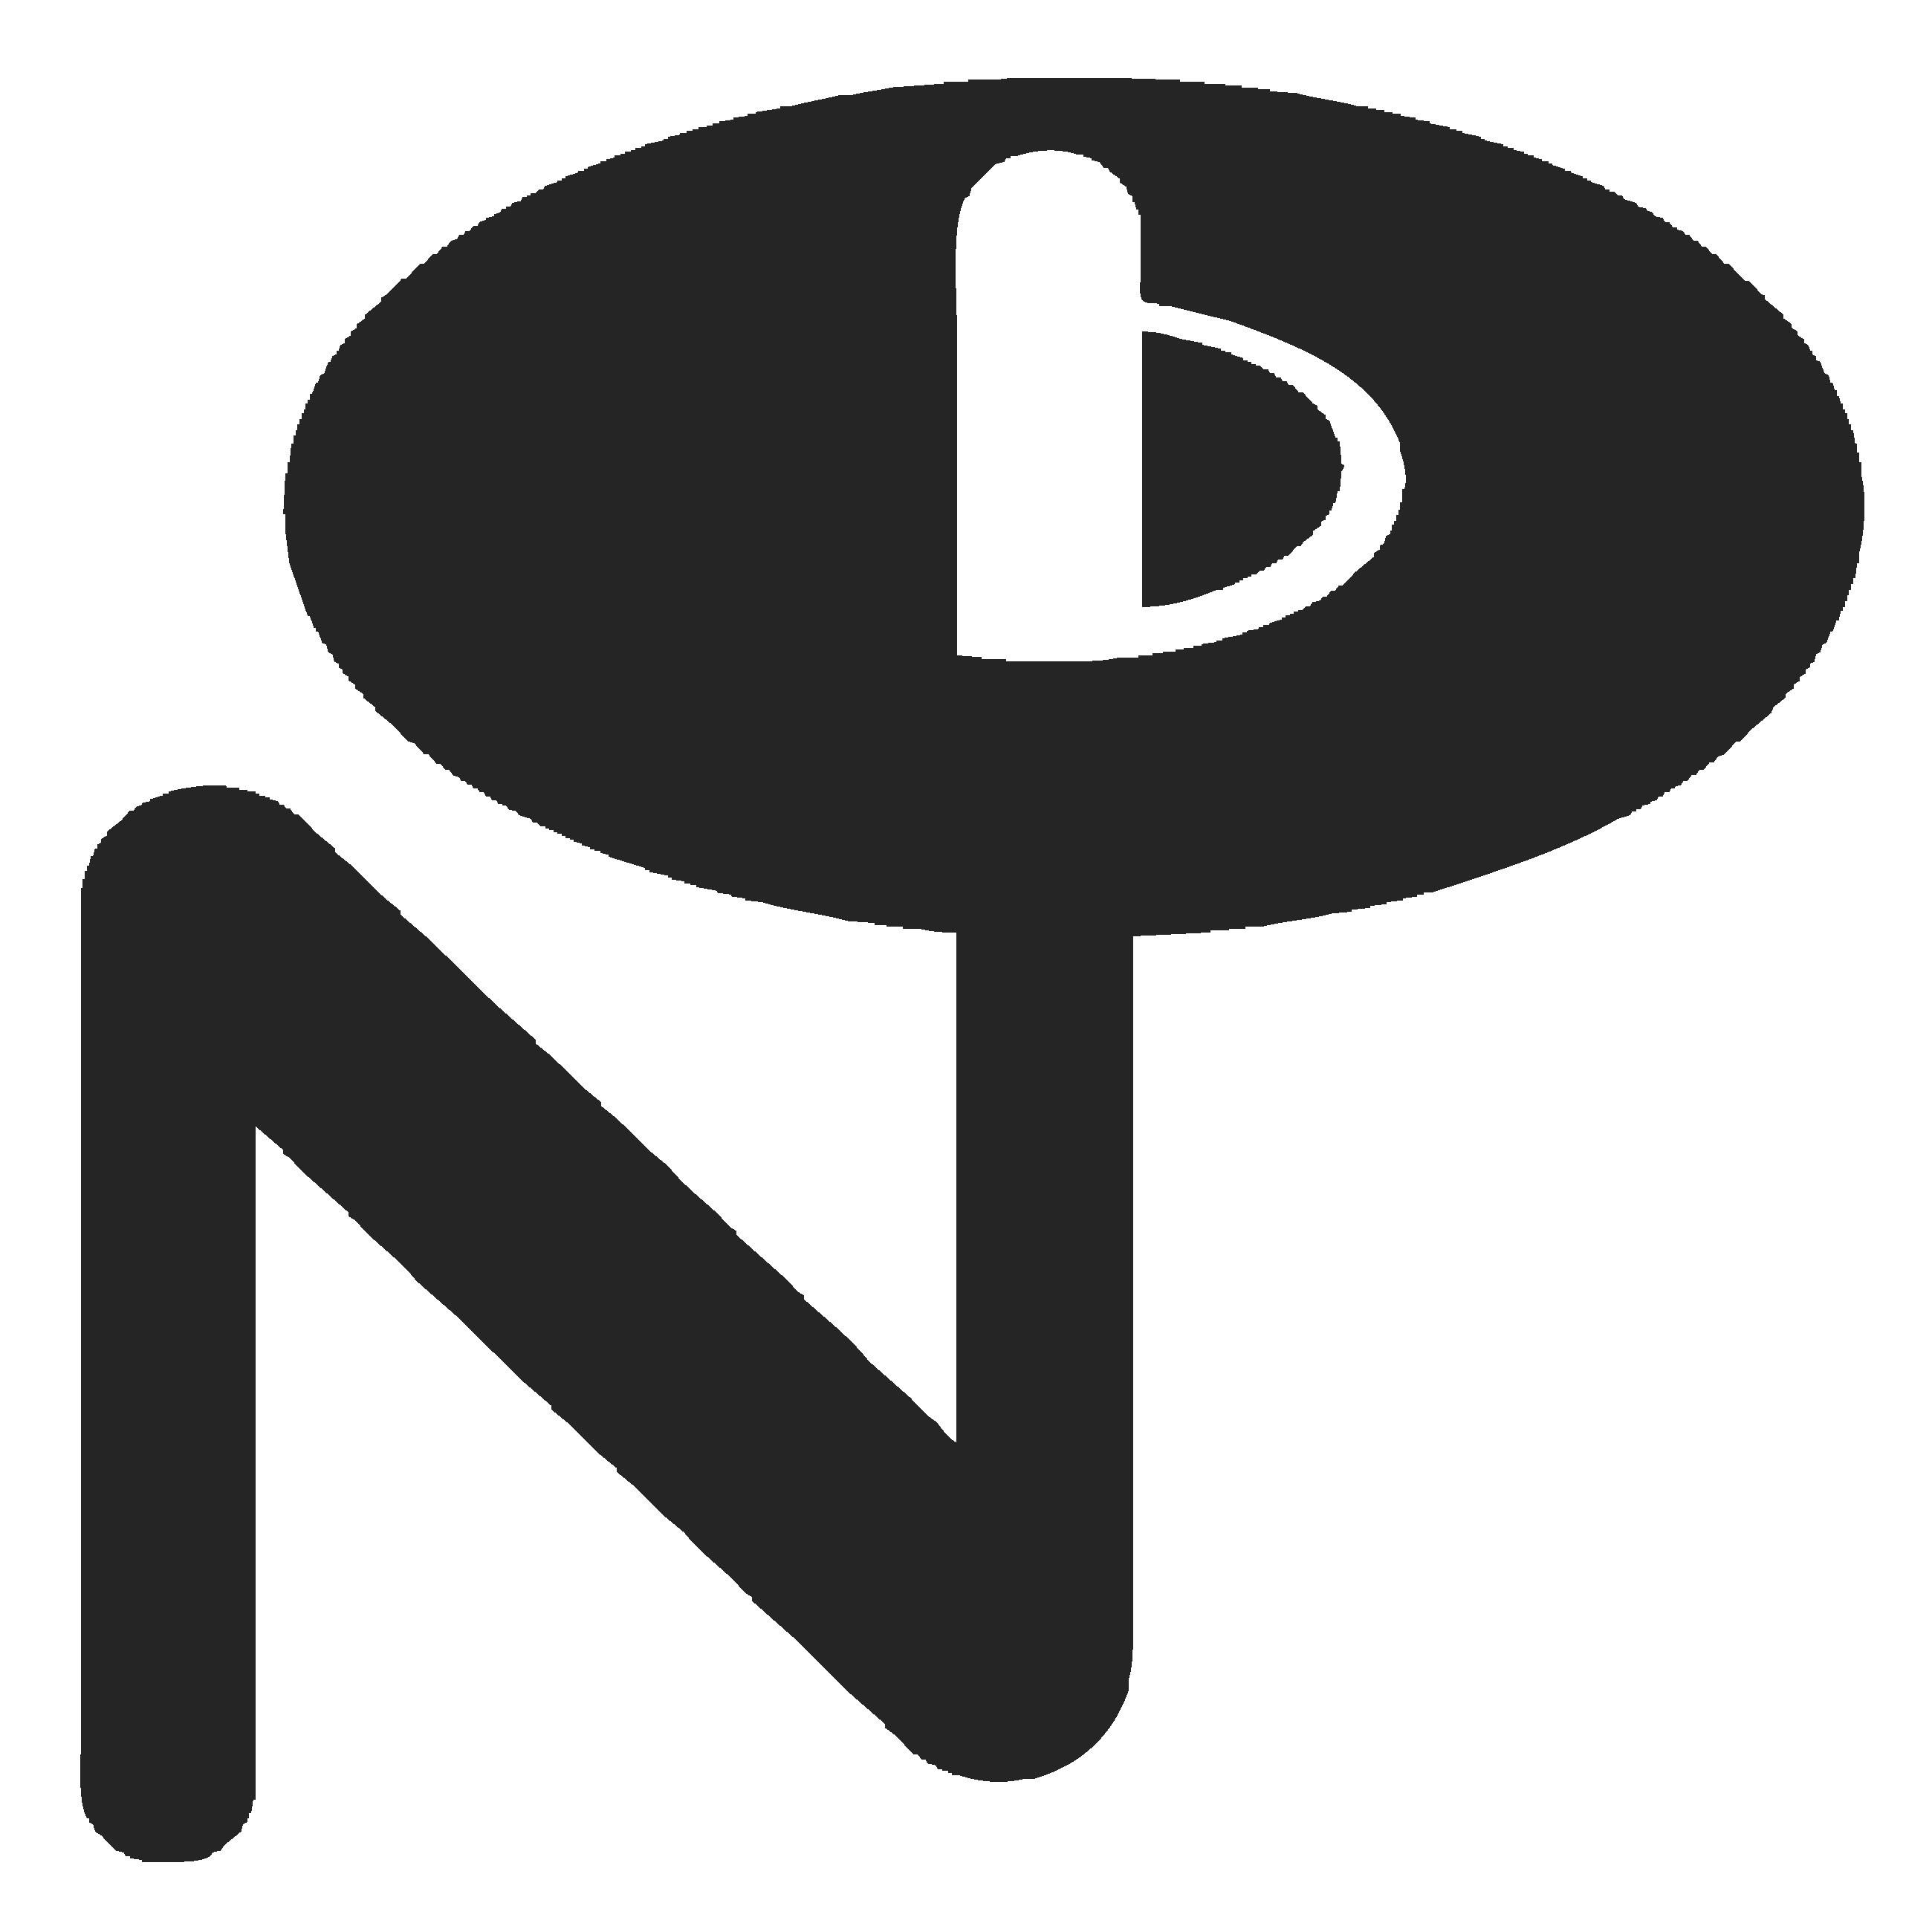 thenumerogroup-logo-2jpg